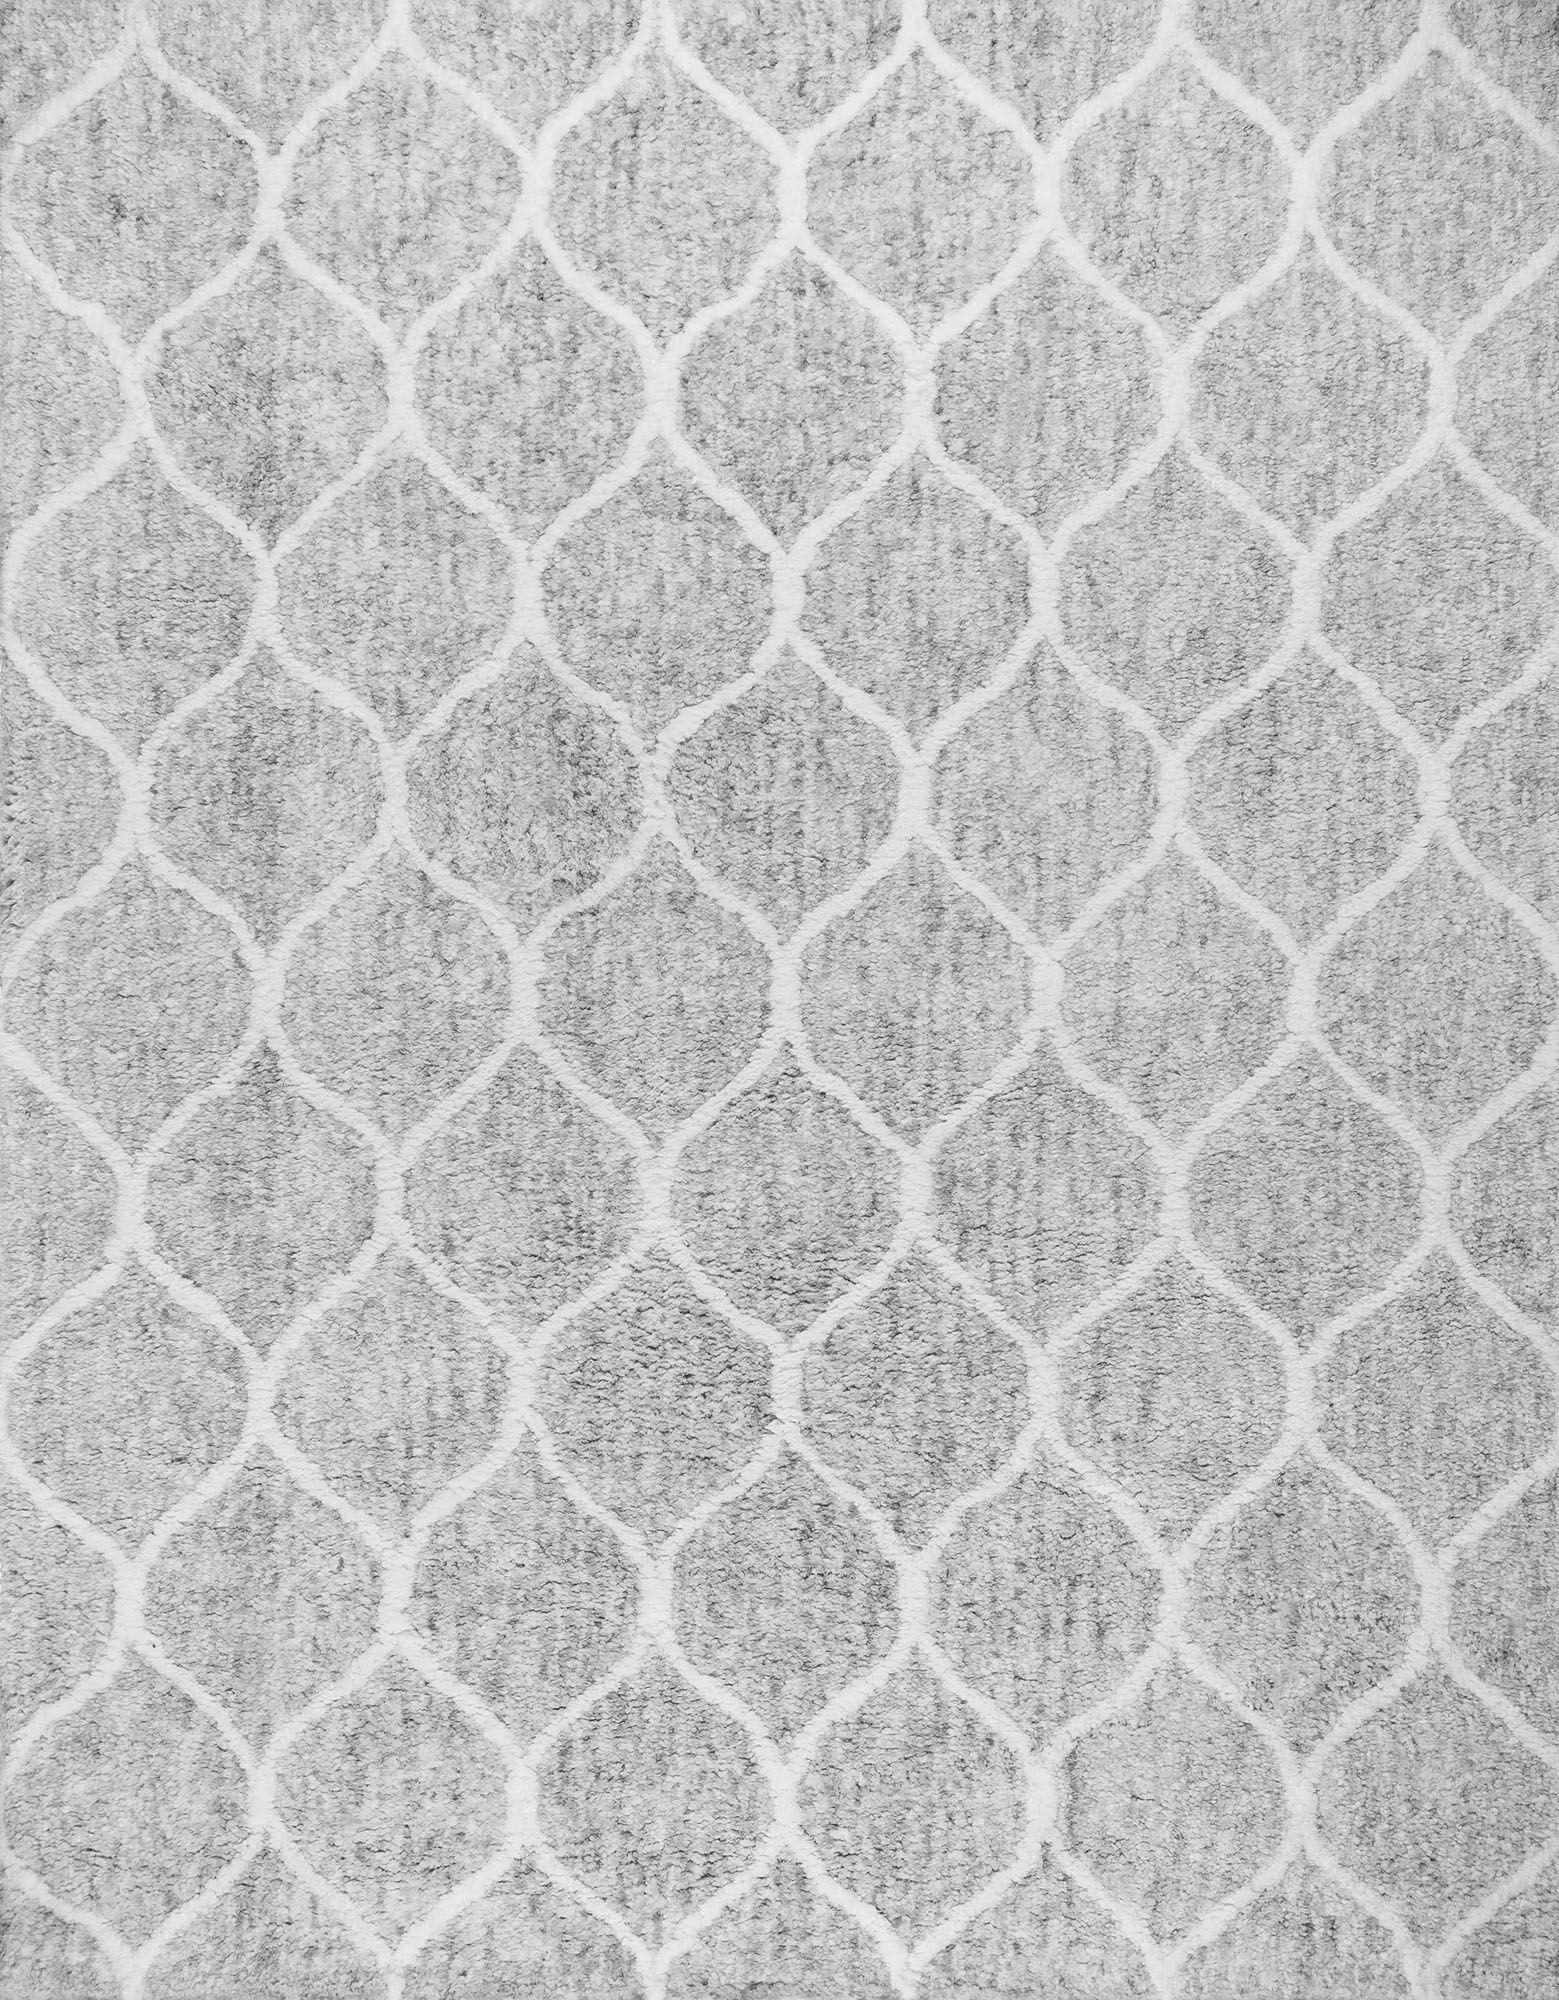 Paris Shag Moroccan Hand Woven Silver Area Rug Rug Size: Rectangle 8' x 10'